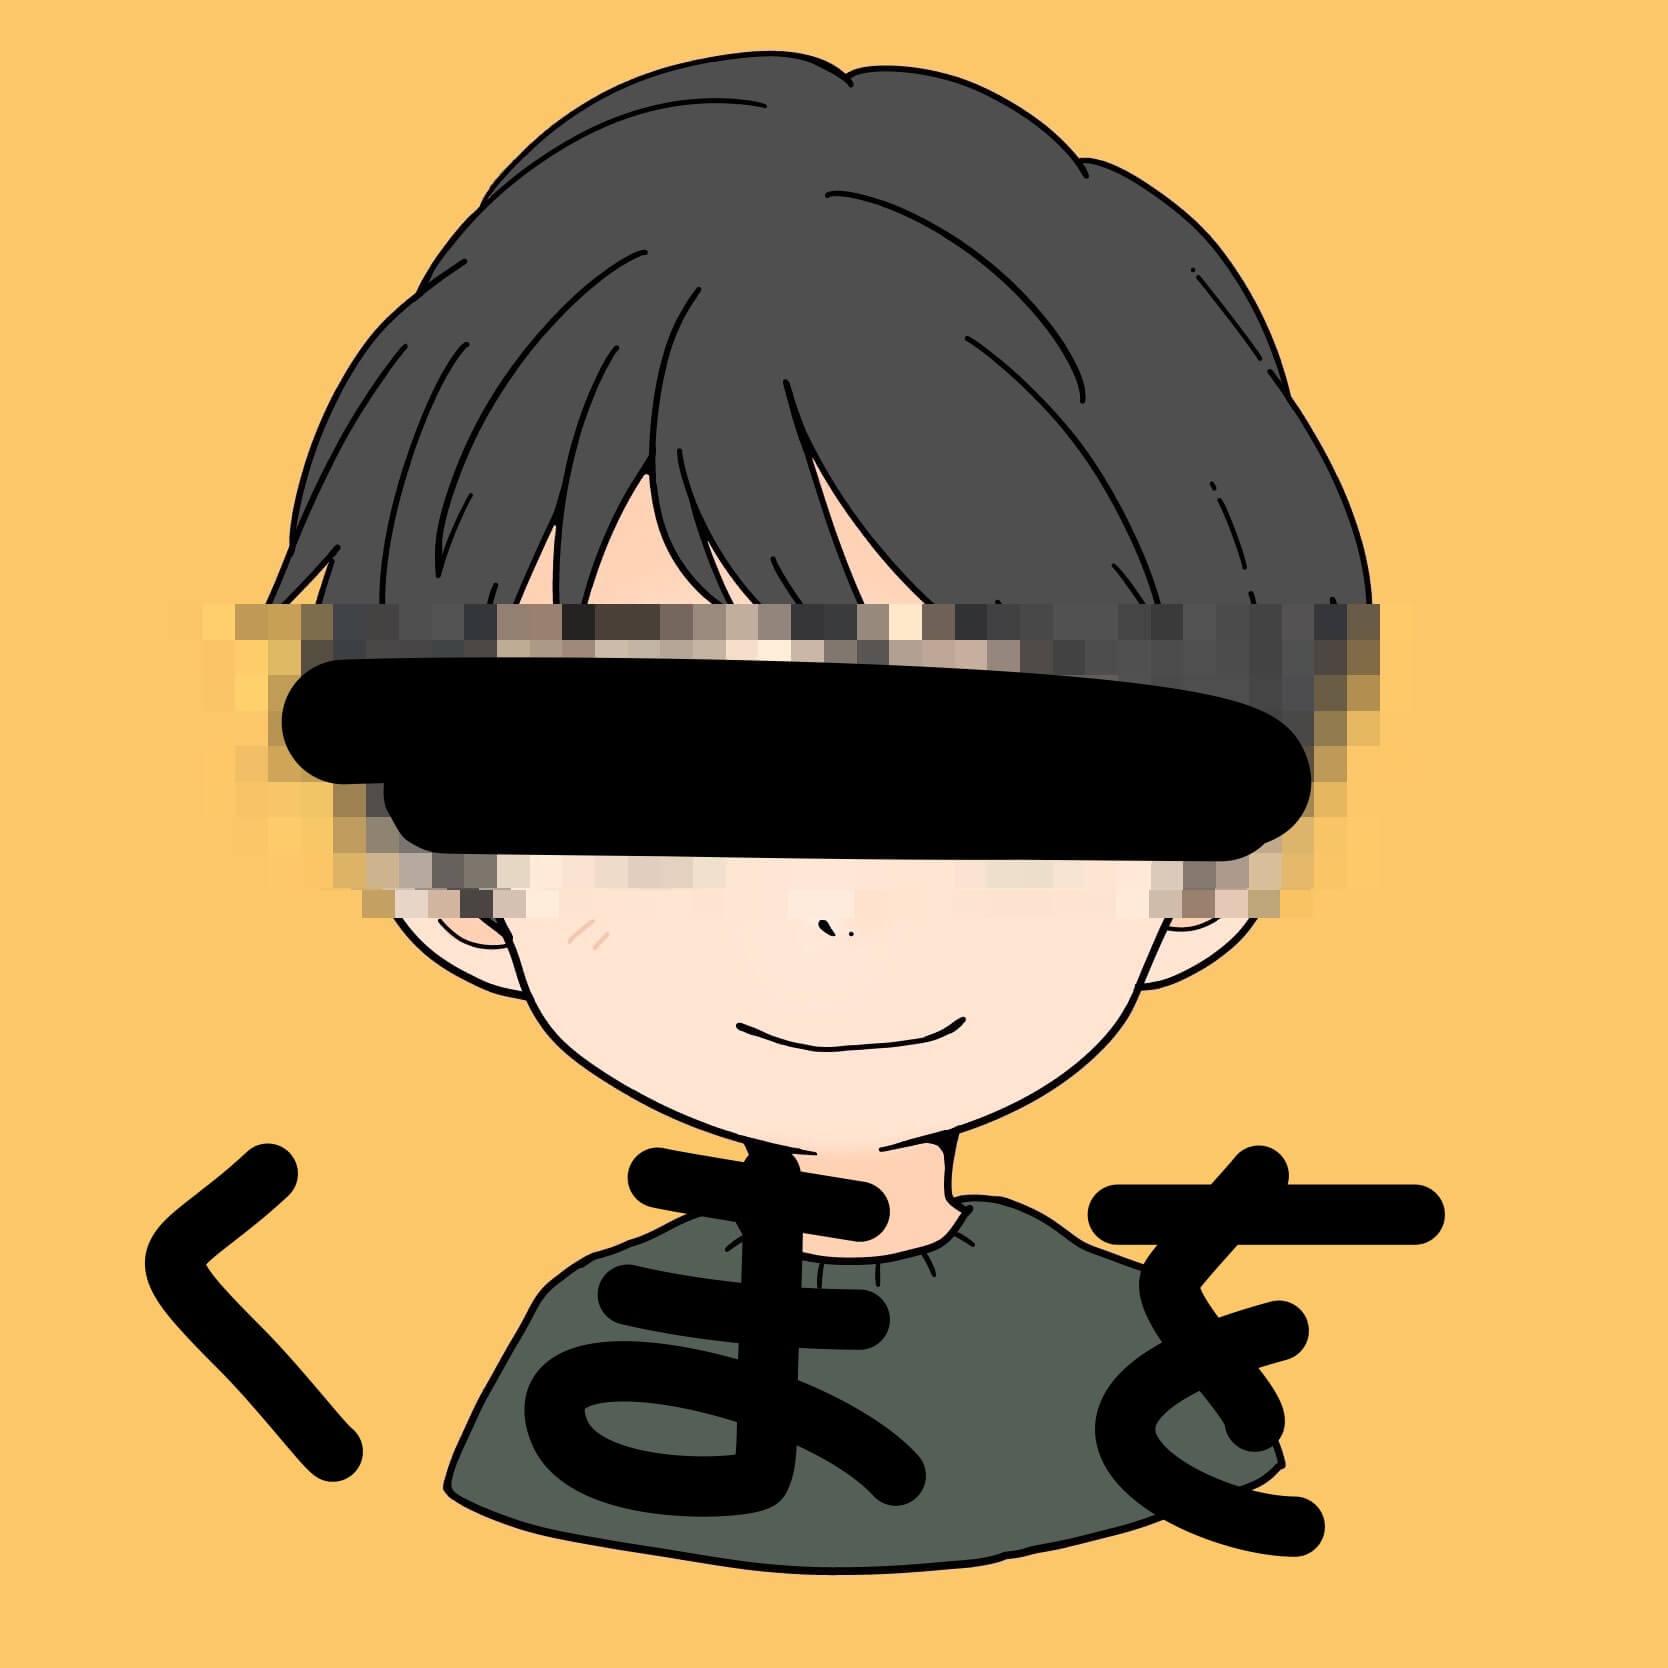 https://www.kumao-blog.com/wp-content/uploads/2020/08/af2679149a2297b9548bdf99c95ba01f.jpg